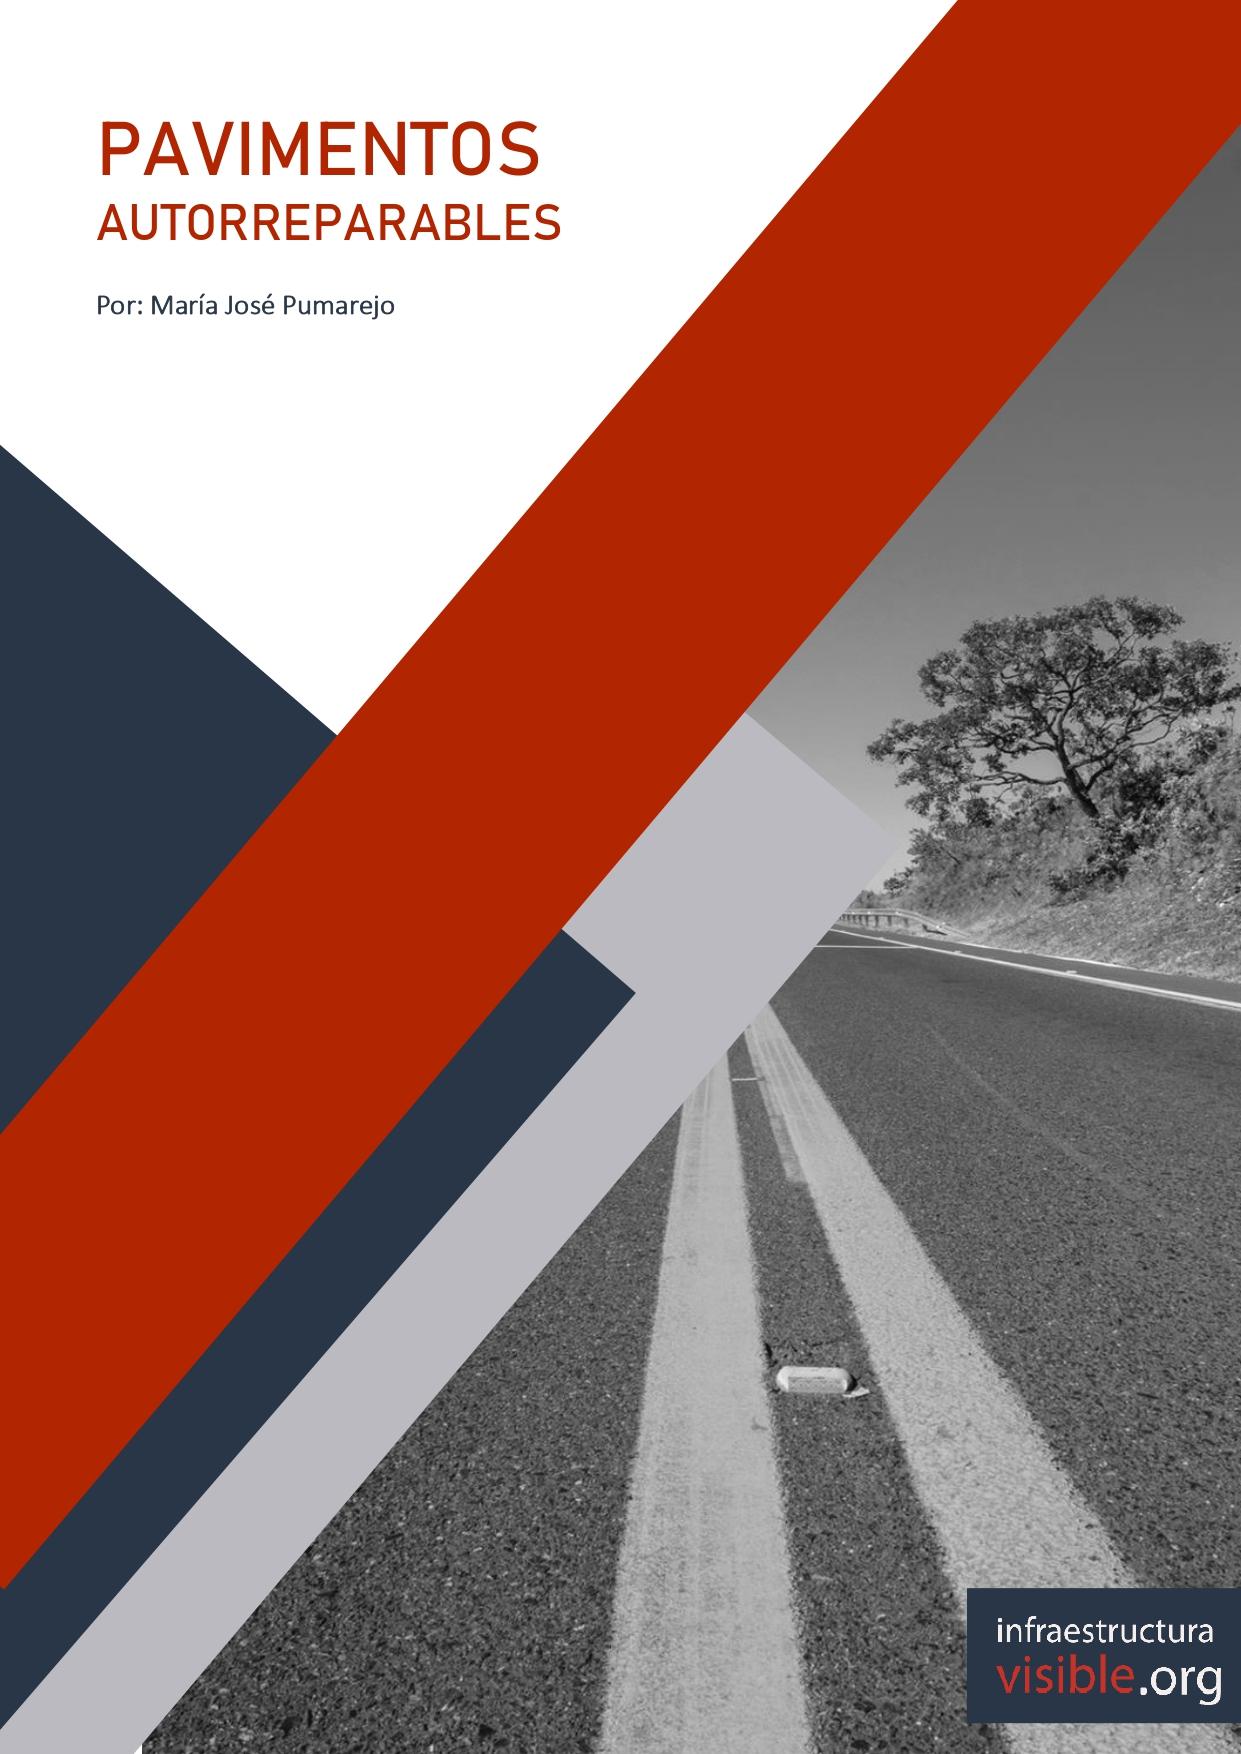 Pavimentos autorreparables